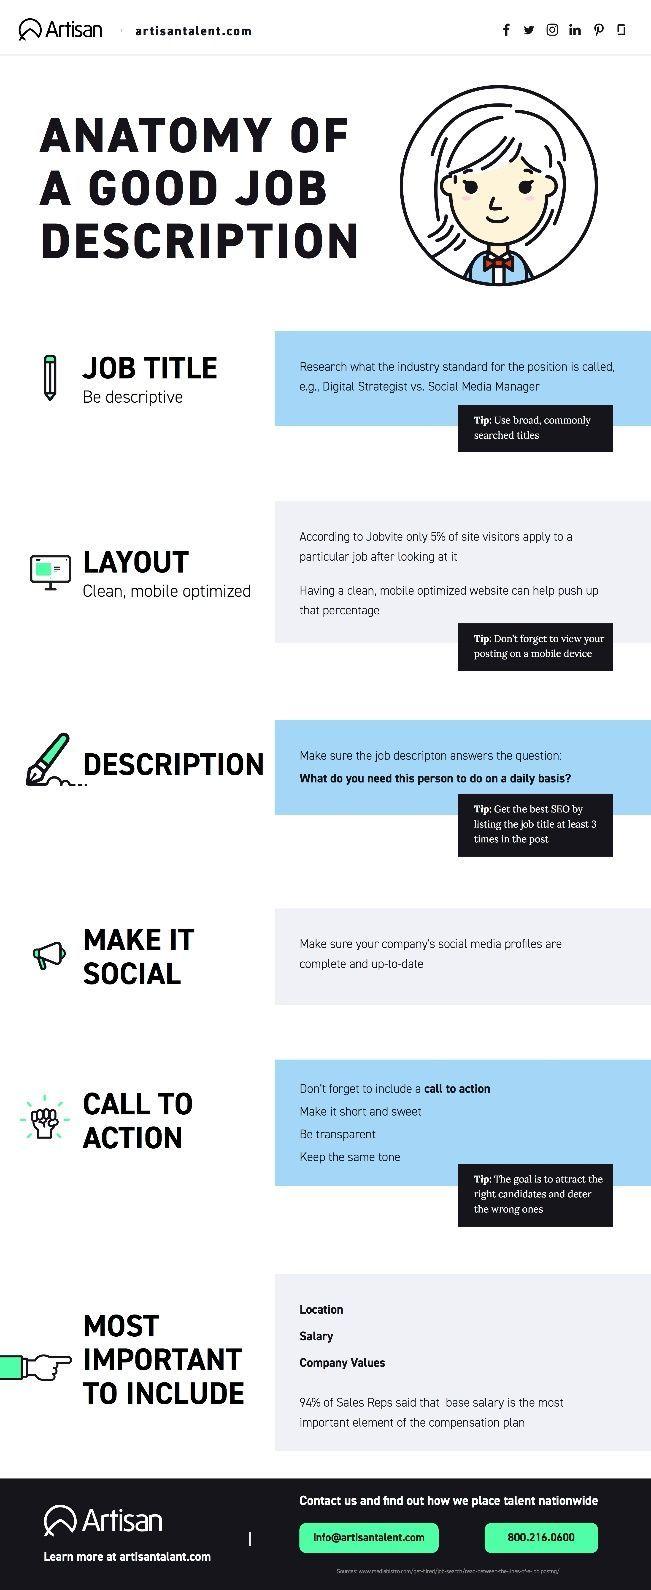 The Anatomy of a Good Job Description {Infographic} Job